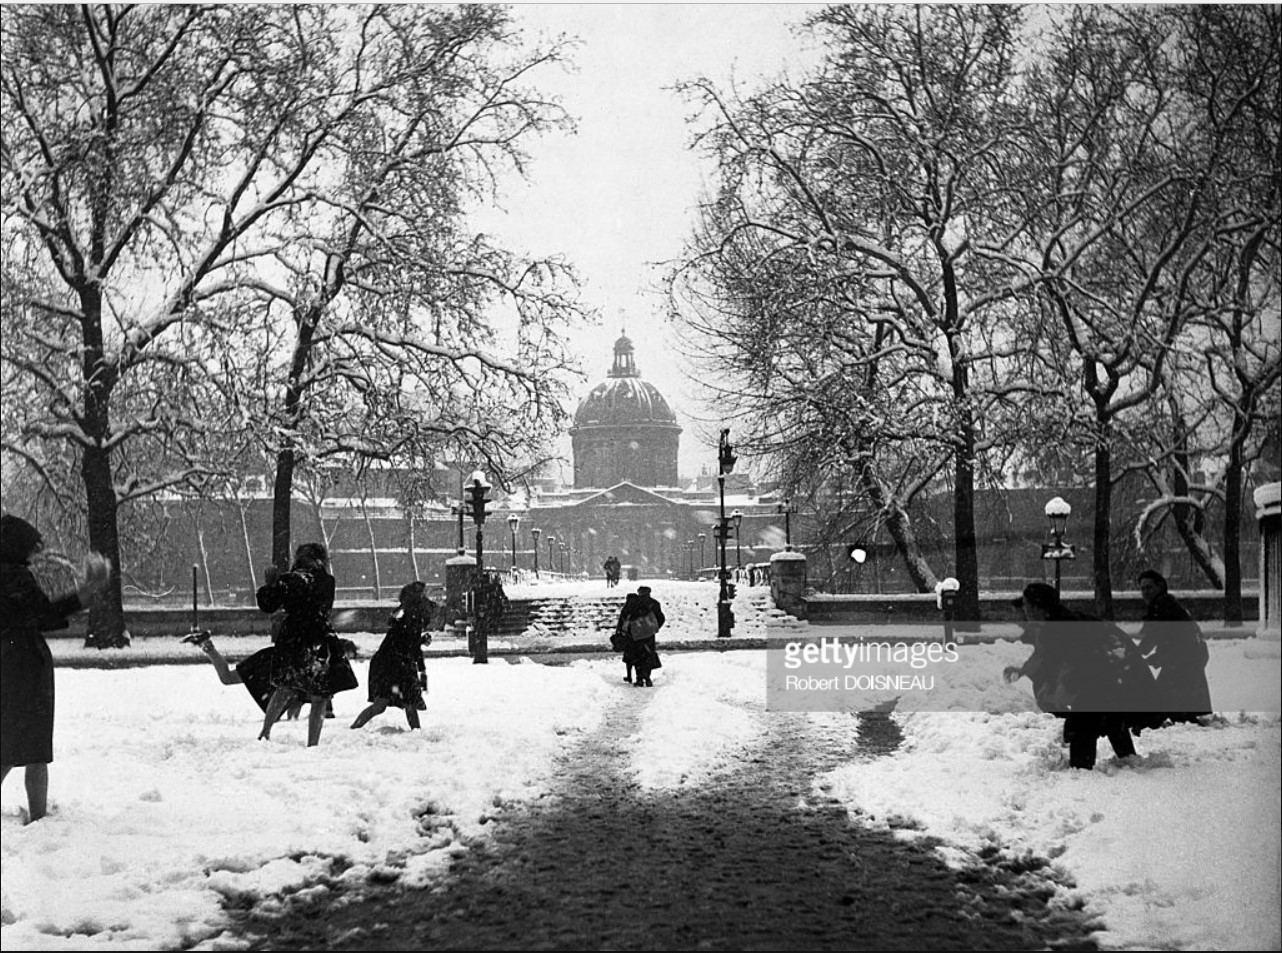 1945. Игра в снежки на Мосту Искусств. Париж